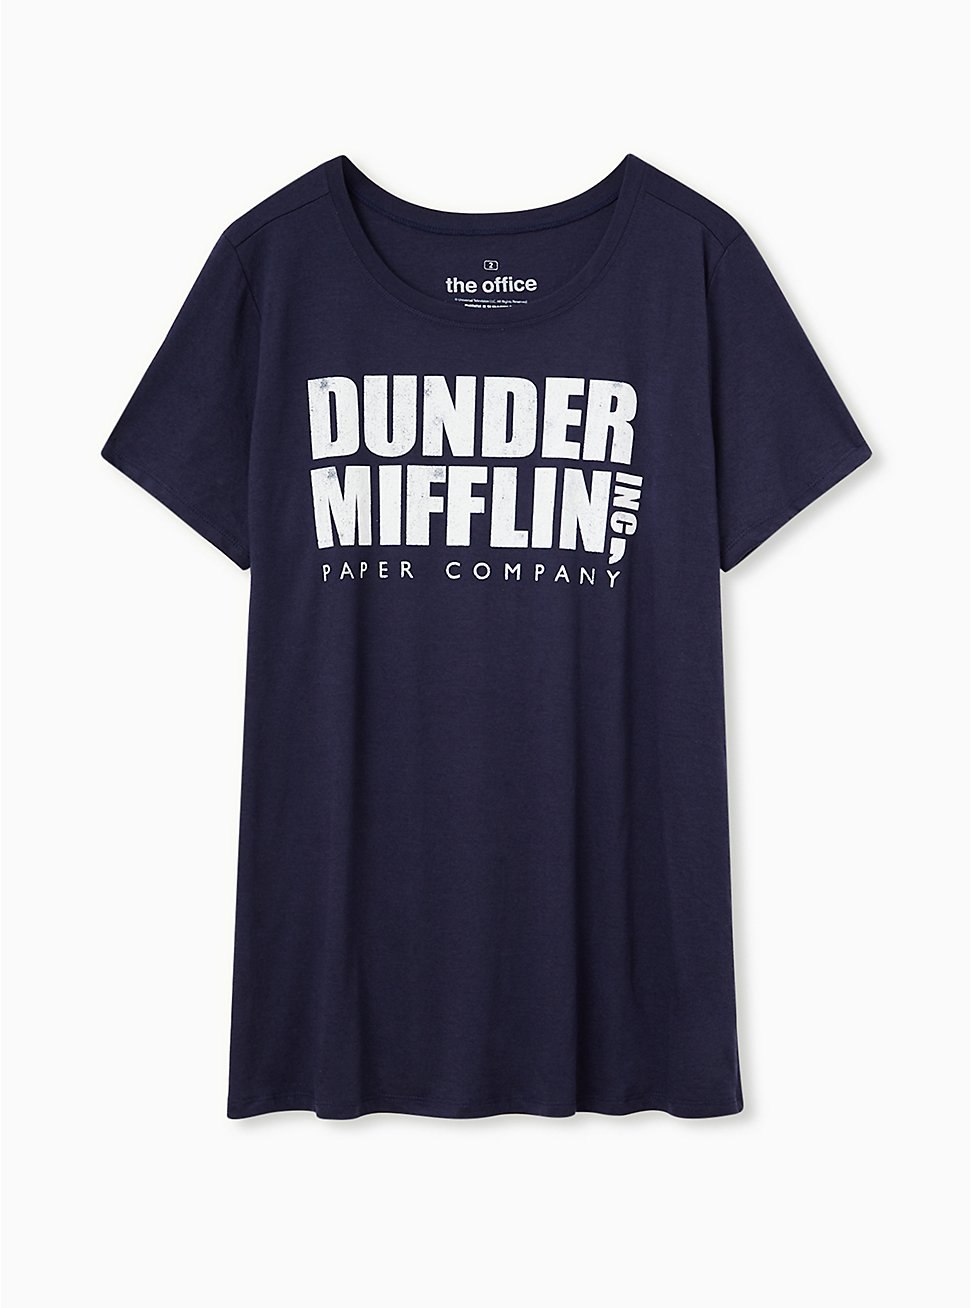 The Office Dunder Mifflin Slim Fit Tee - Navy, PEACOAT, hi-res